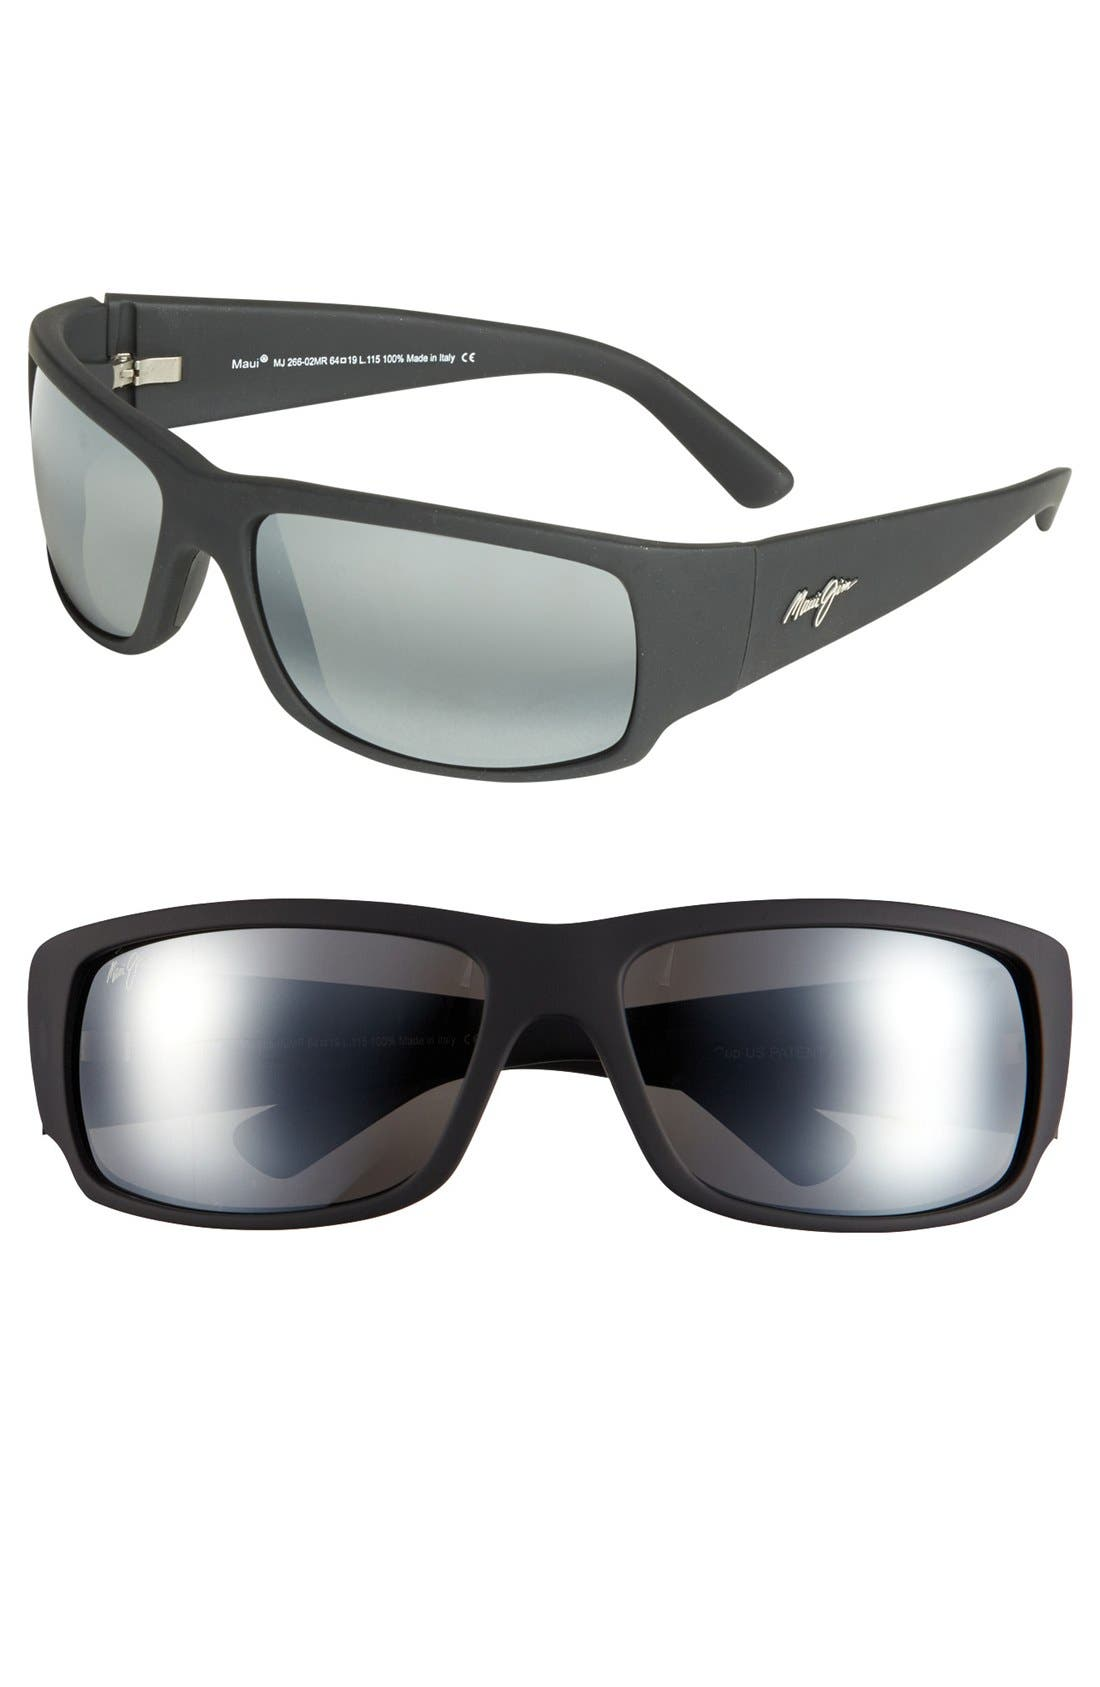 Main Image - Maui Jim 'World Cup - PolarizedPlus®2' 64mm Sunglasses